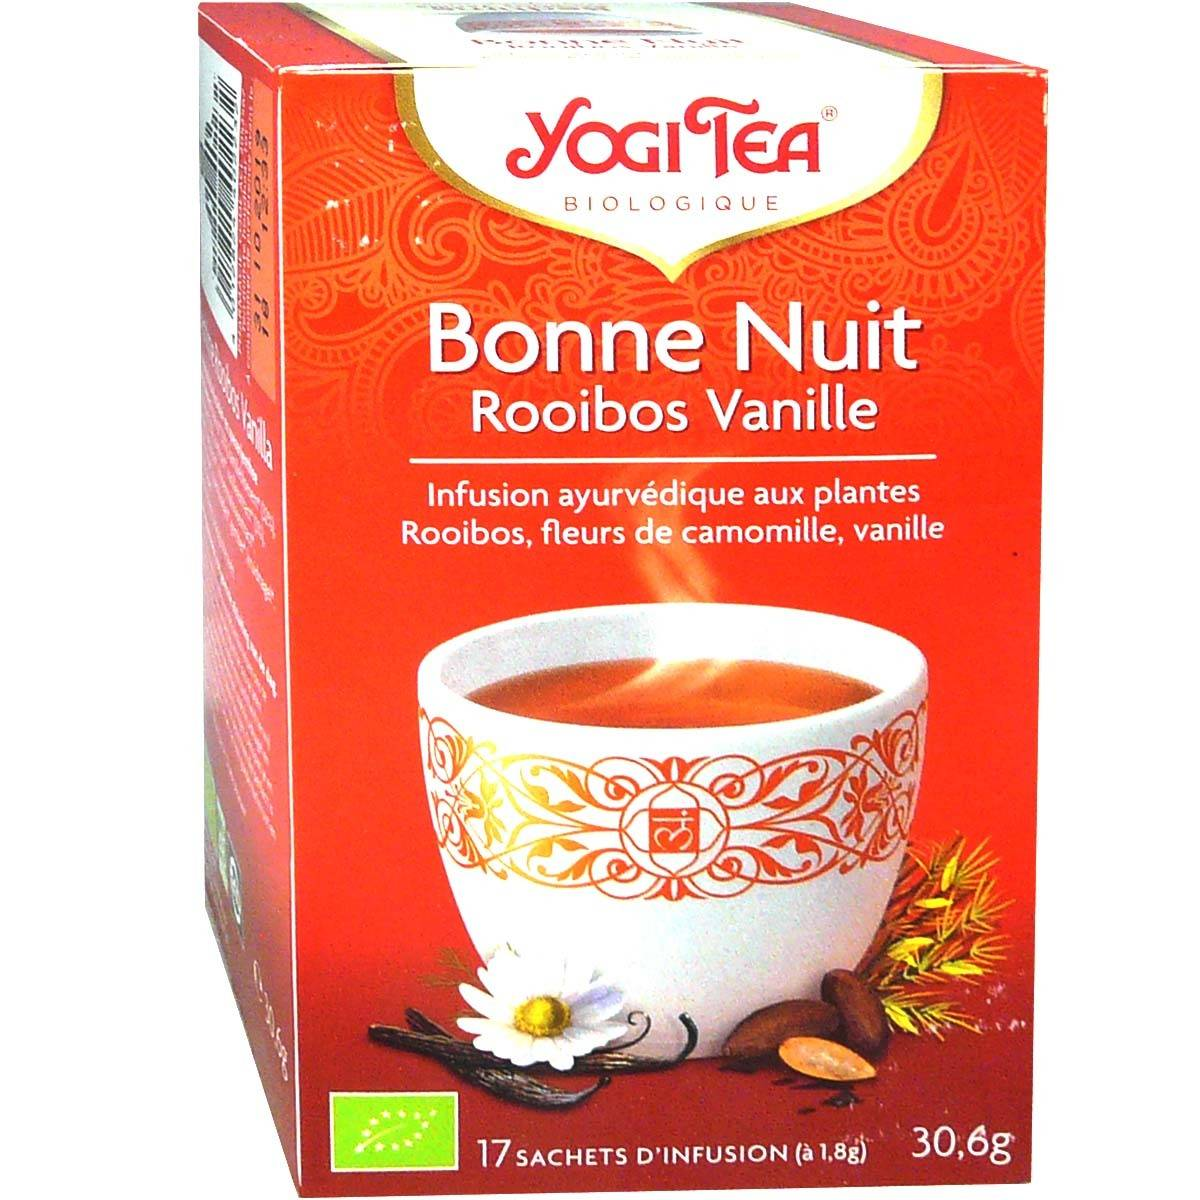 Yogi tea infusion rooibos vanille bonne nuit x17 sachets